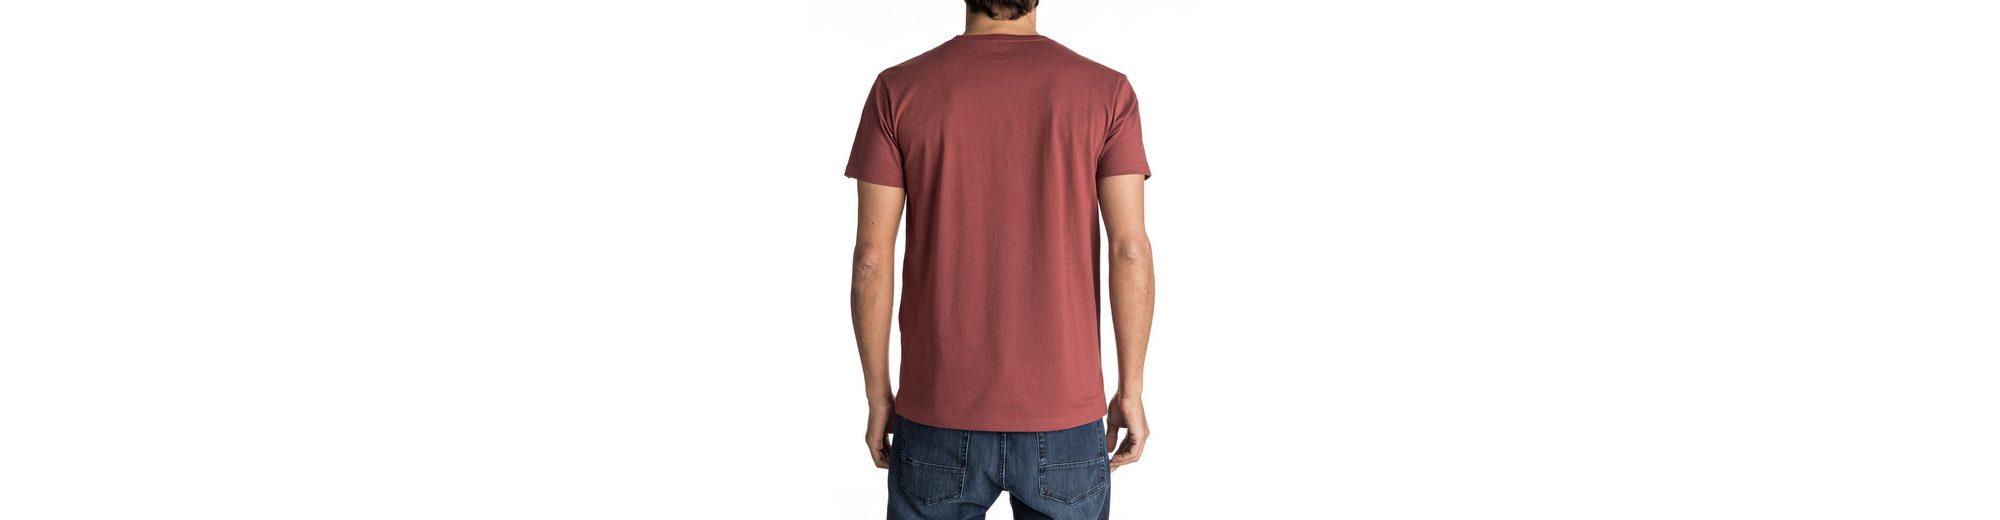 T East Shirt Quiksilver Morning Glide Quiksilver Sust T qx1ECzwX